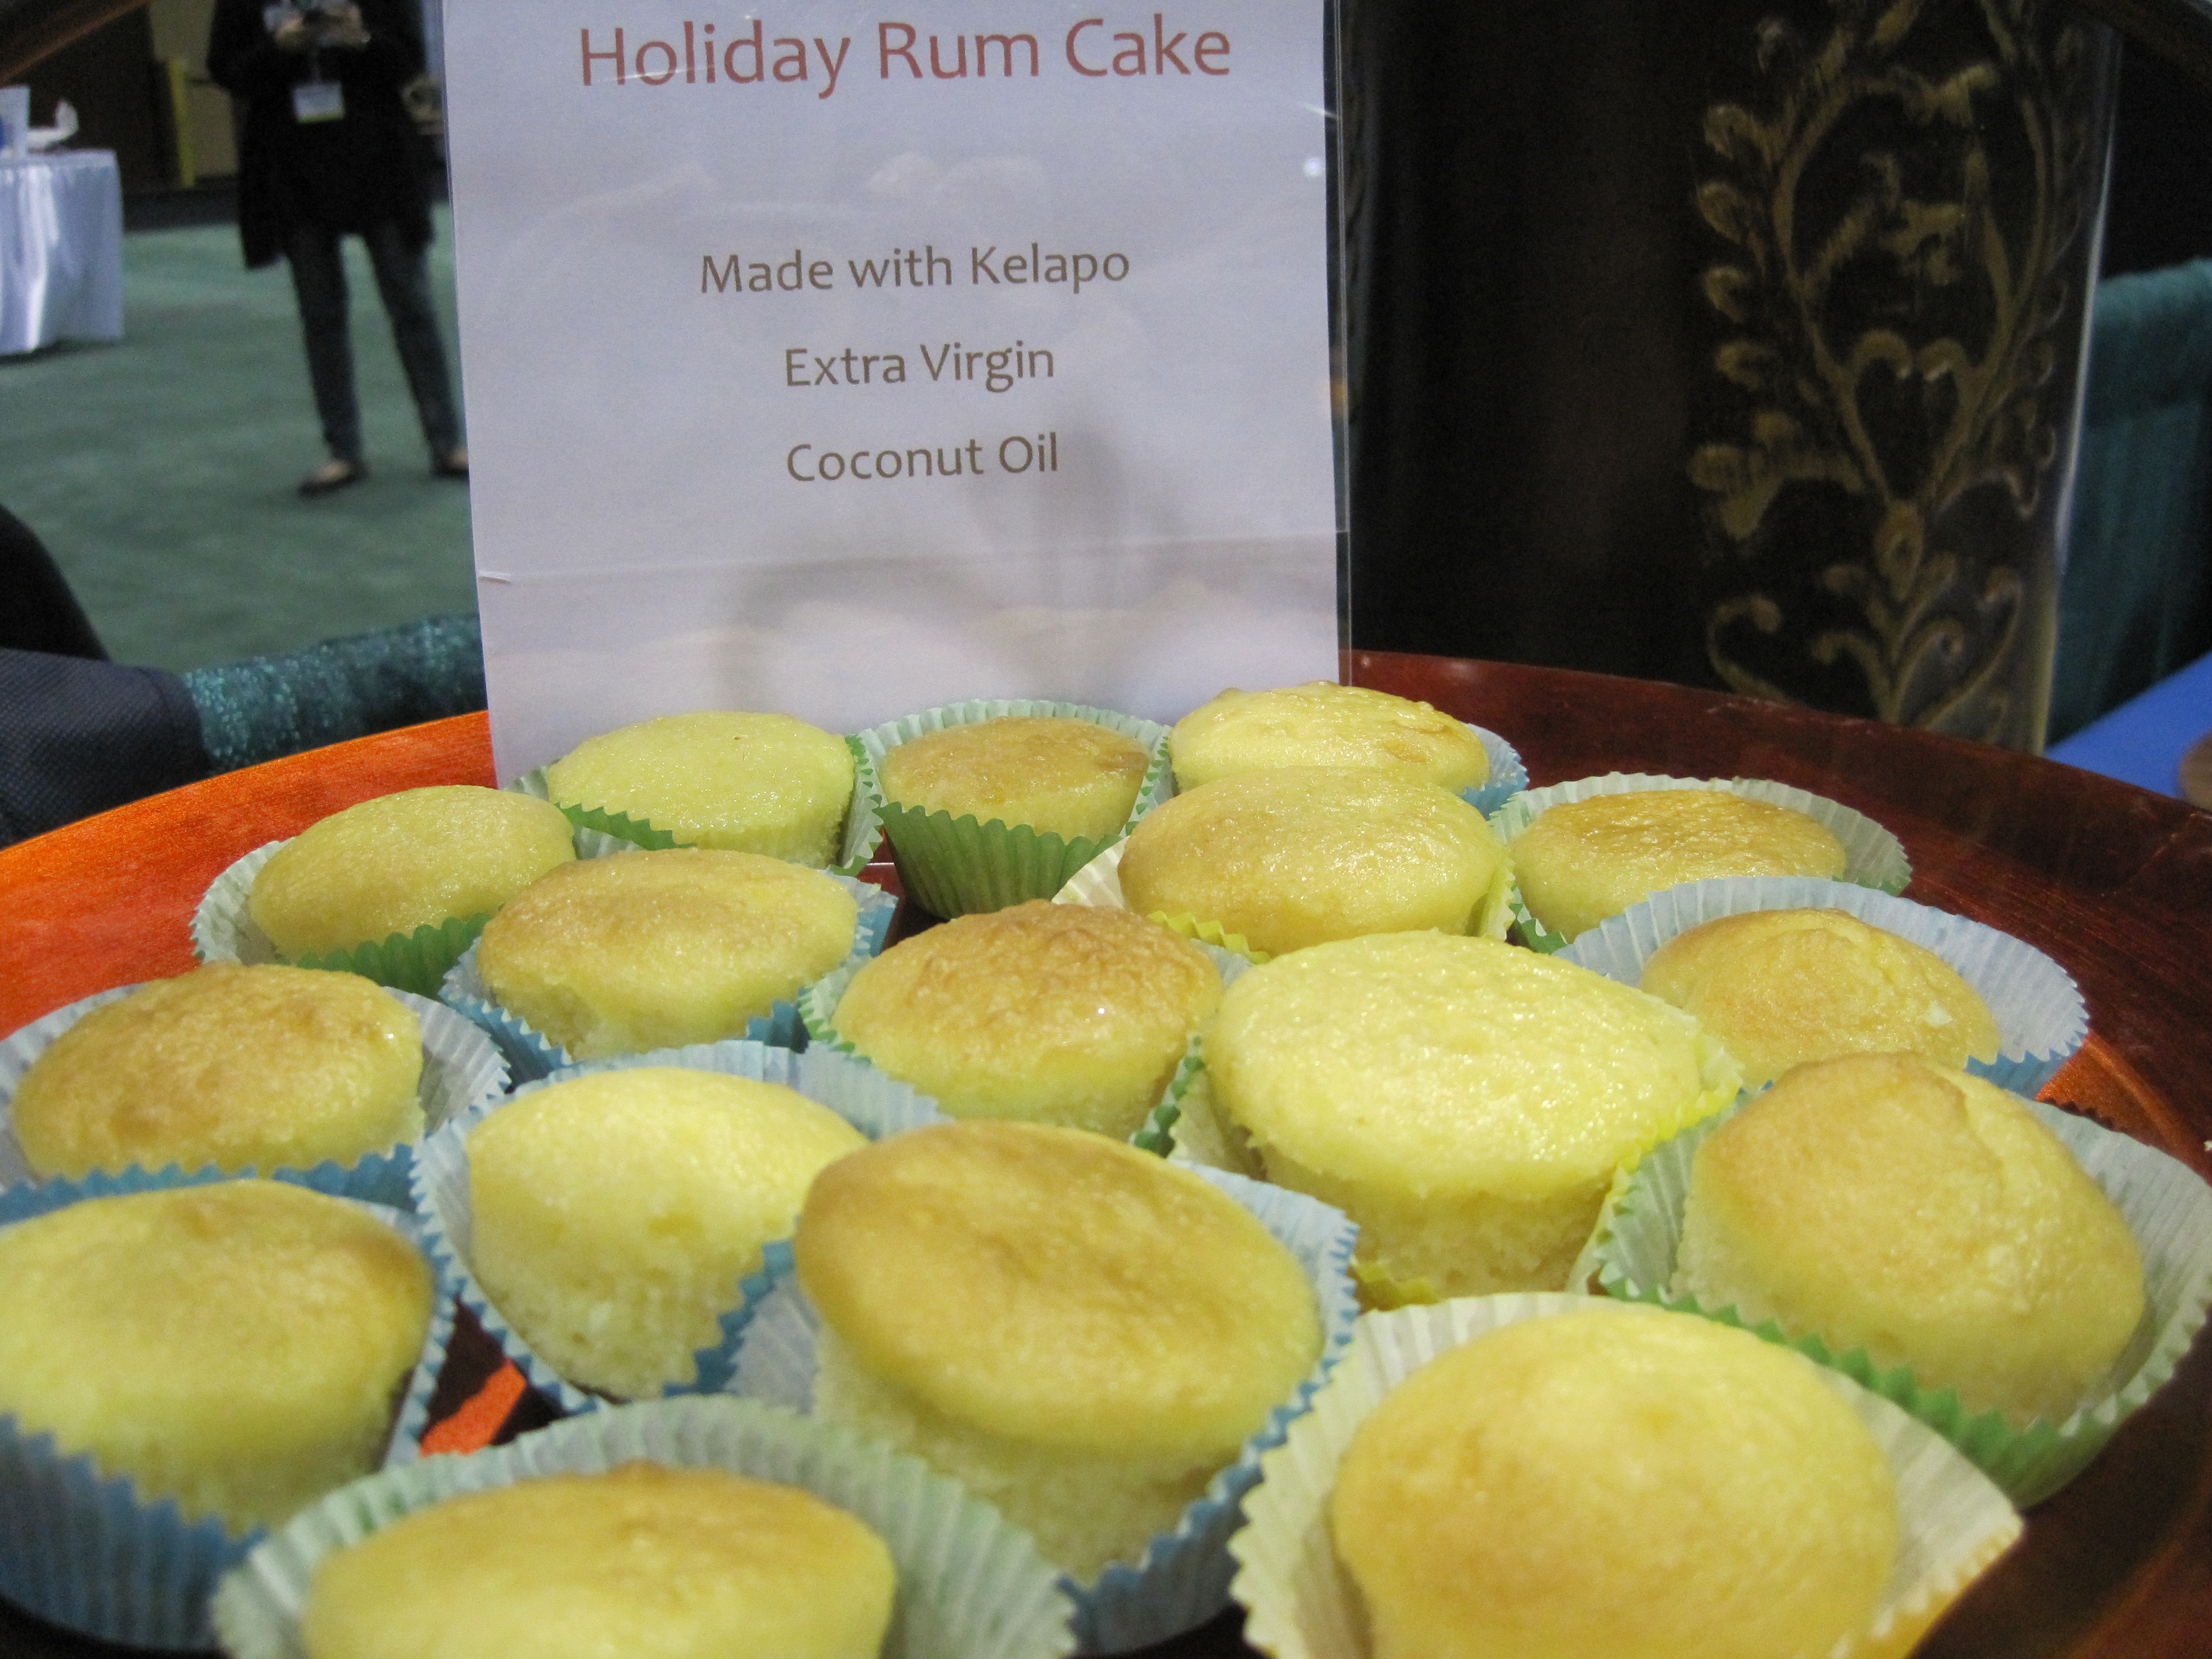 Holiday Rum Cake Served At Soho